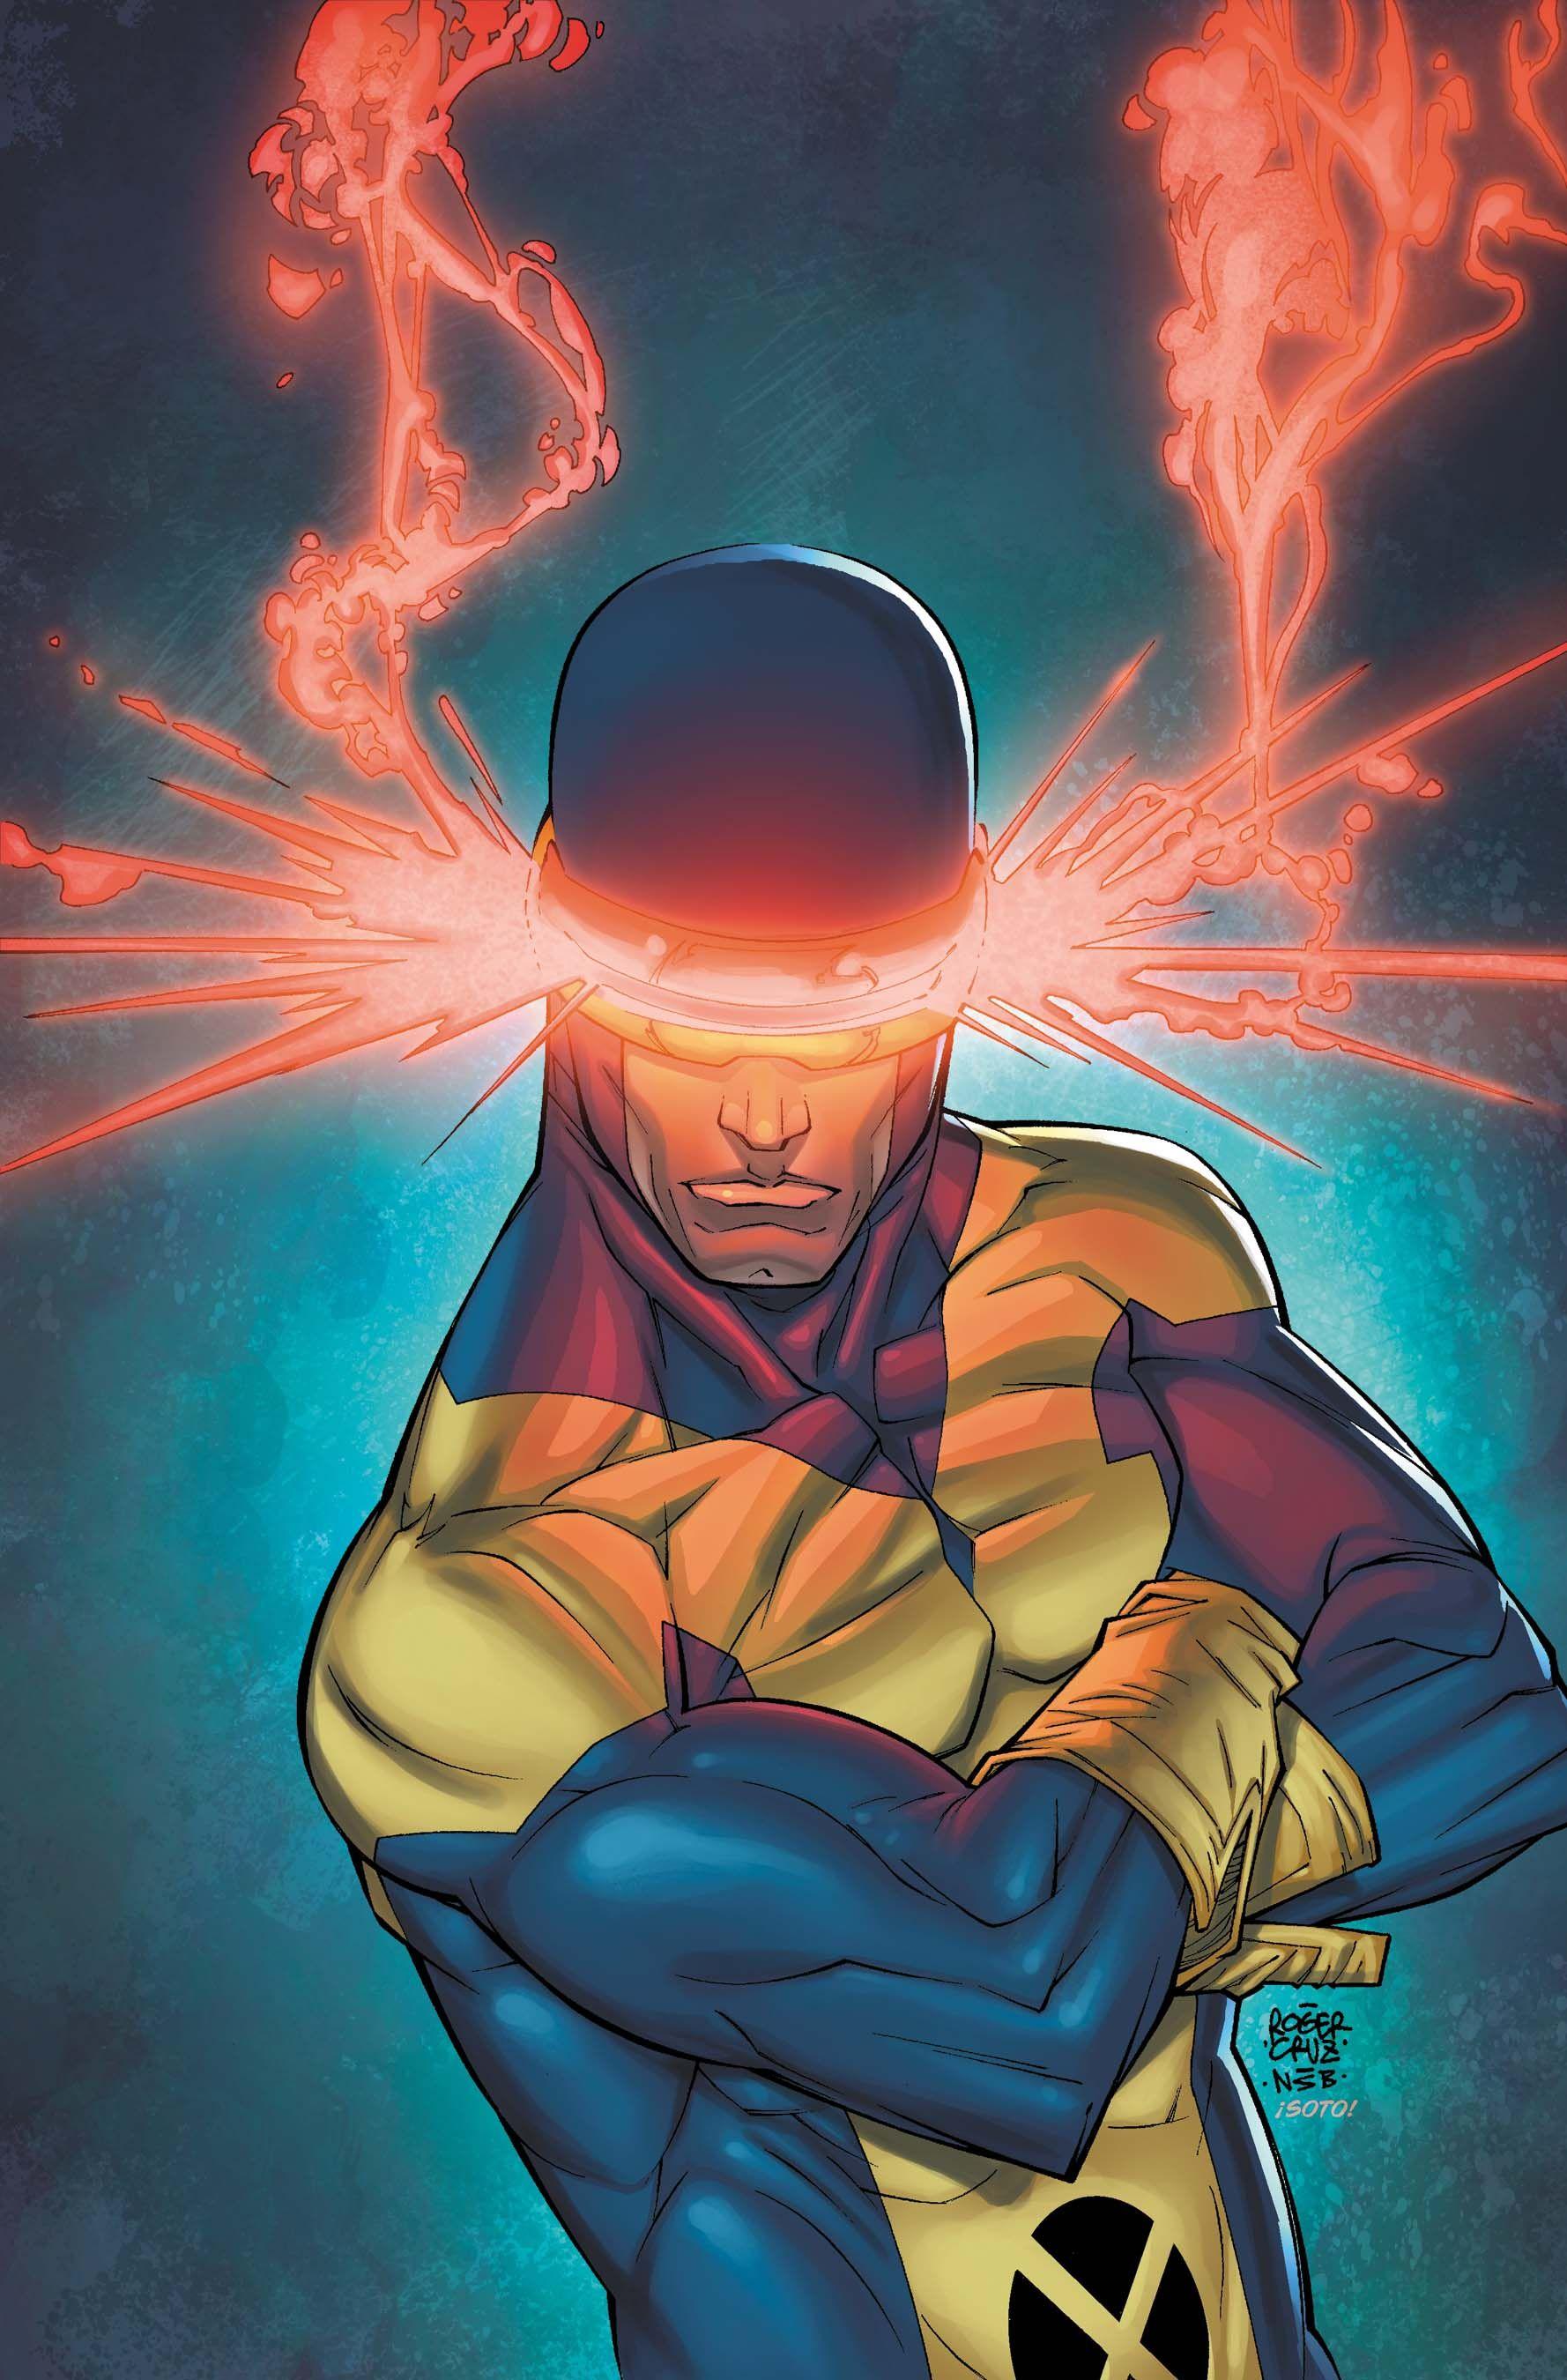 Scott Summers/Cyclops/PowersOptic Force Blasts, Spatial